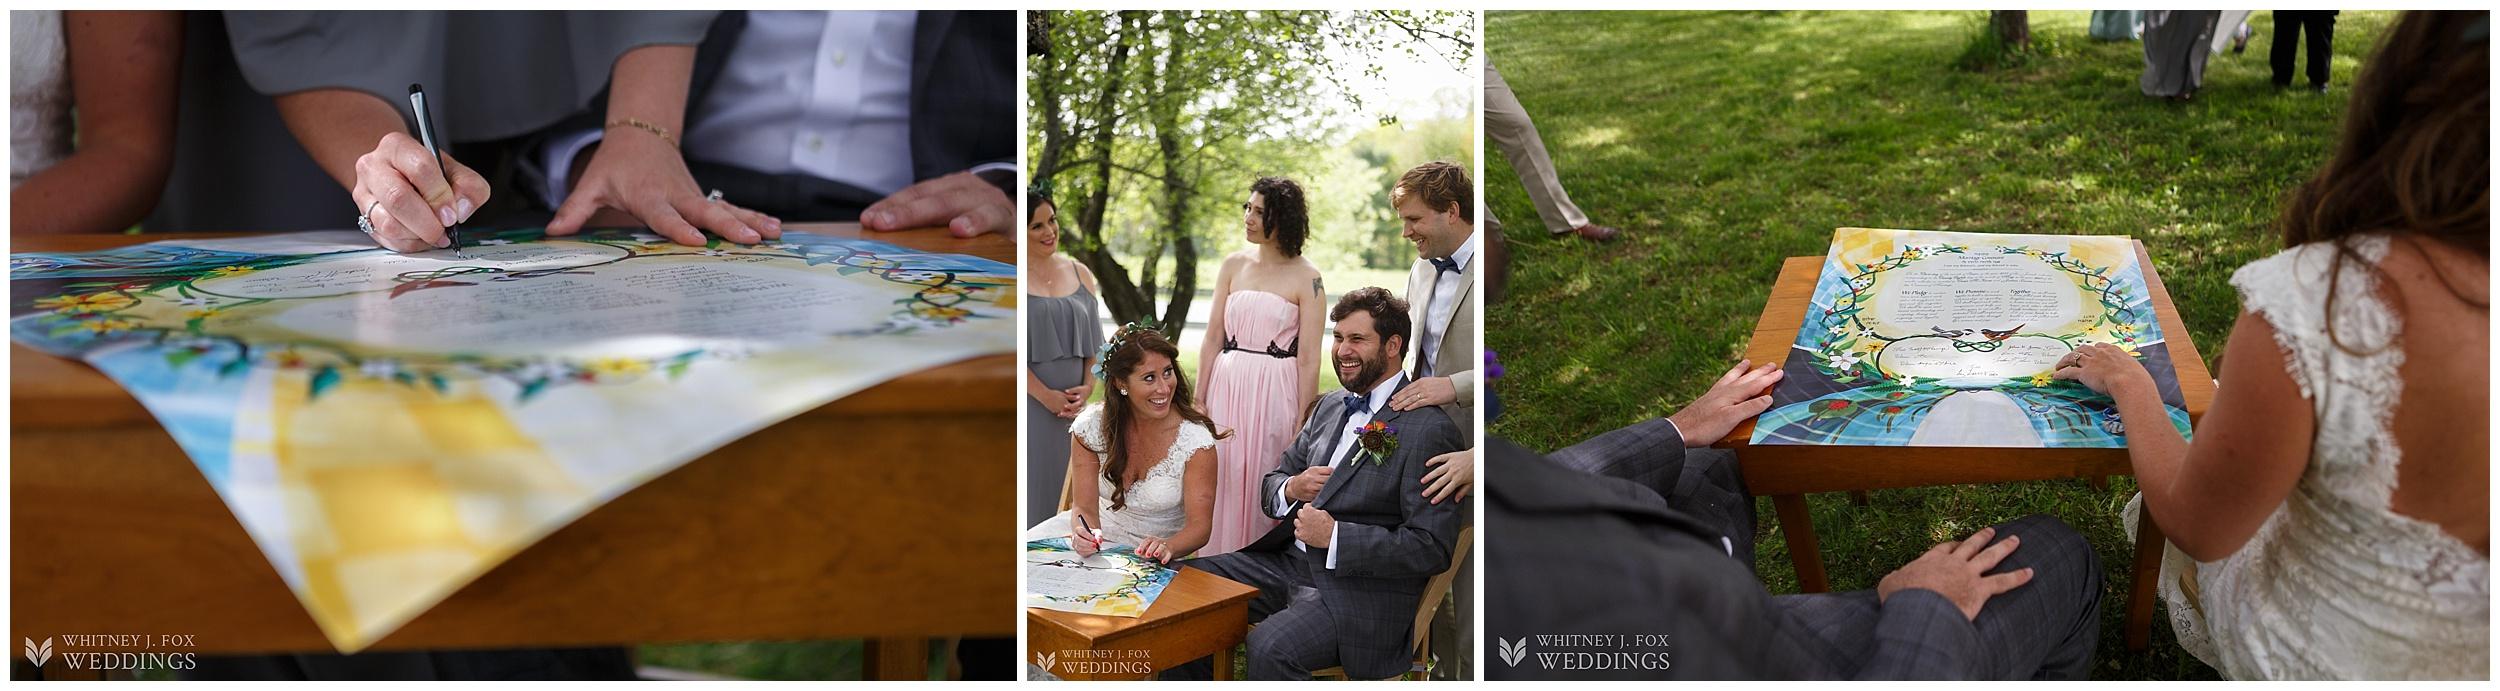 28_56_tai_josh_the_homestead_rest_be_thankful_farm_lyman_maine_photographer_whitney_j_fox_weddings_9741.jpg